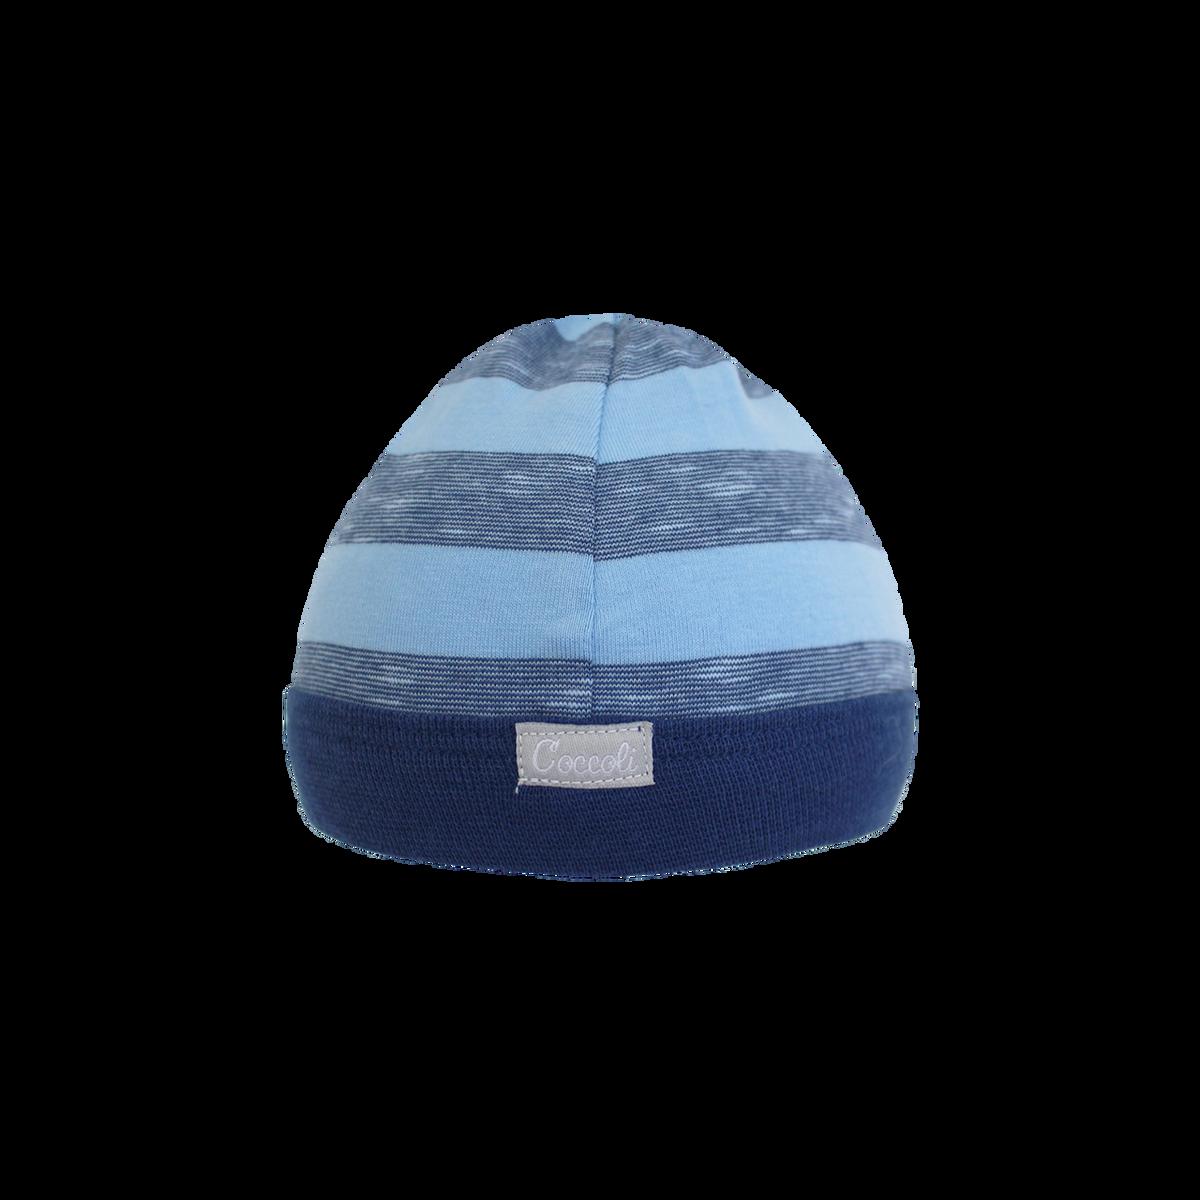 Coccoli Slub Jersey | Cap | N/1 - 9/12m | BJ4302-582